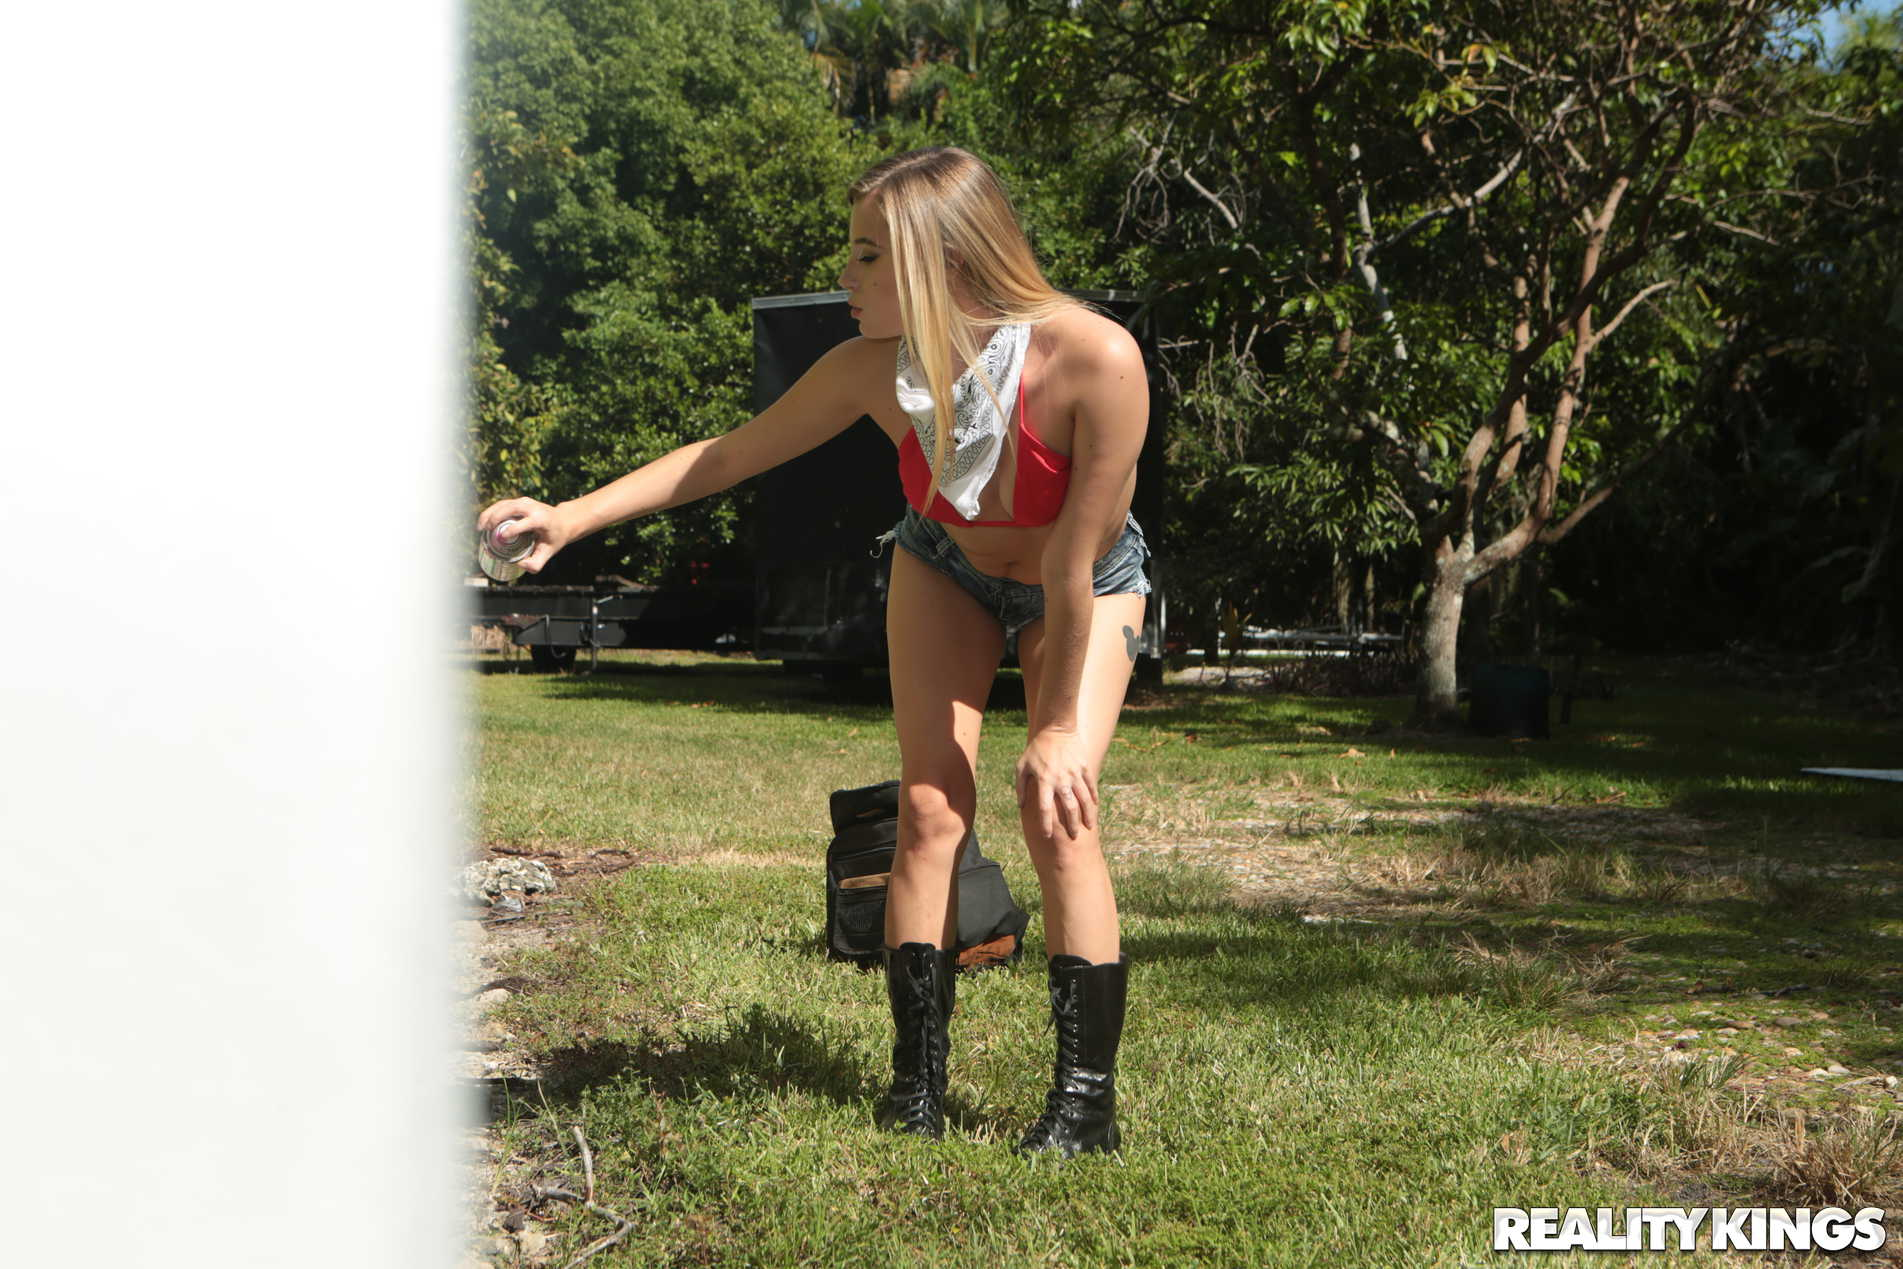 Reality Kings 'Spray And Play' starring Carolina Sweets (Photo 45)